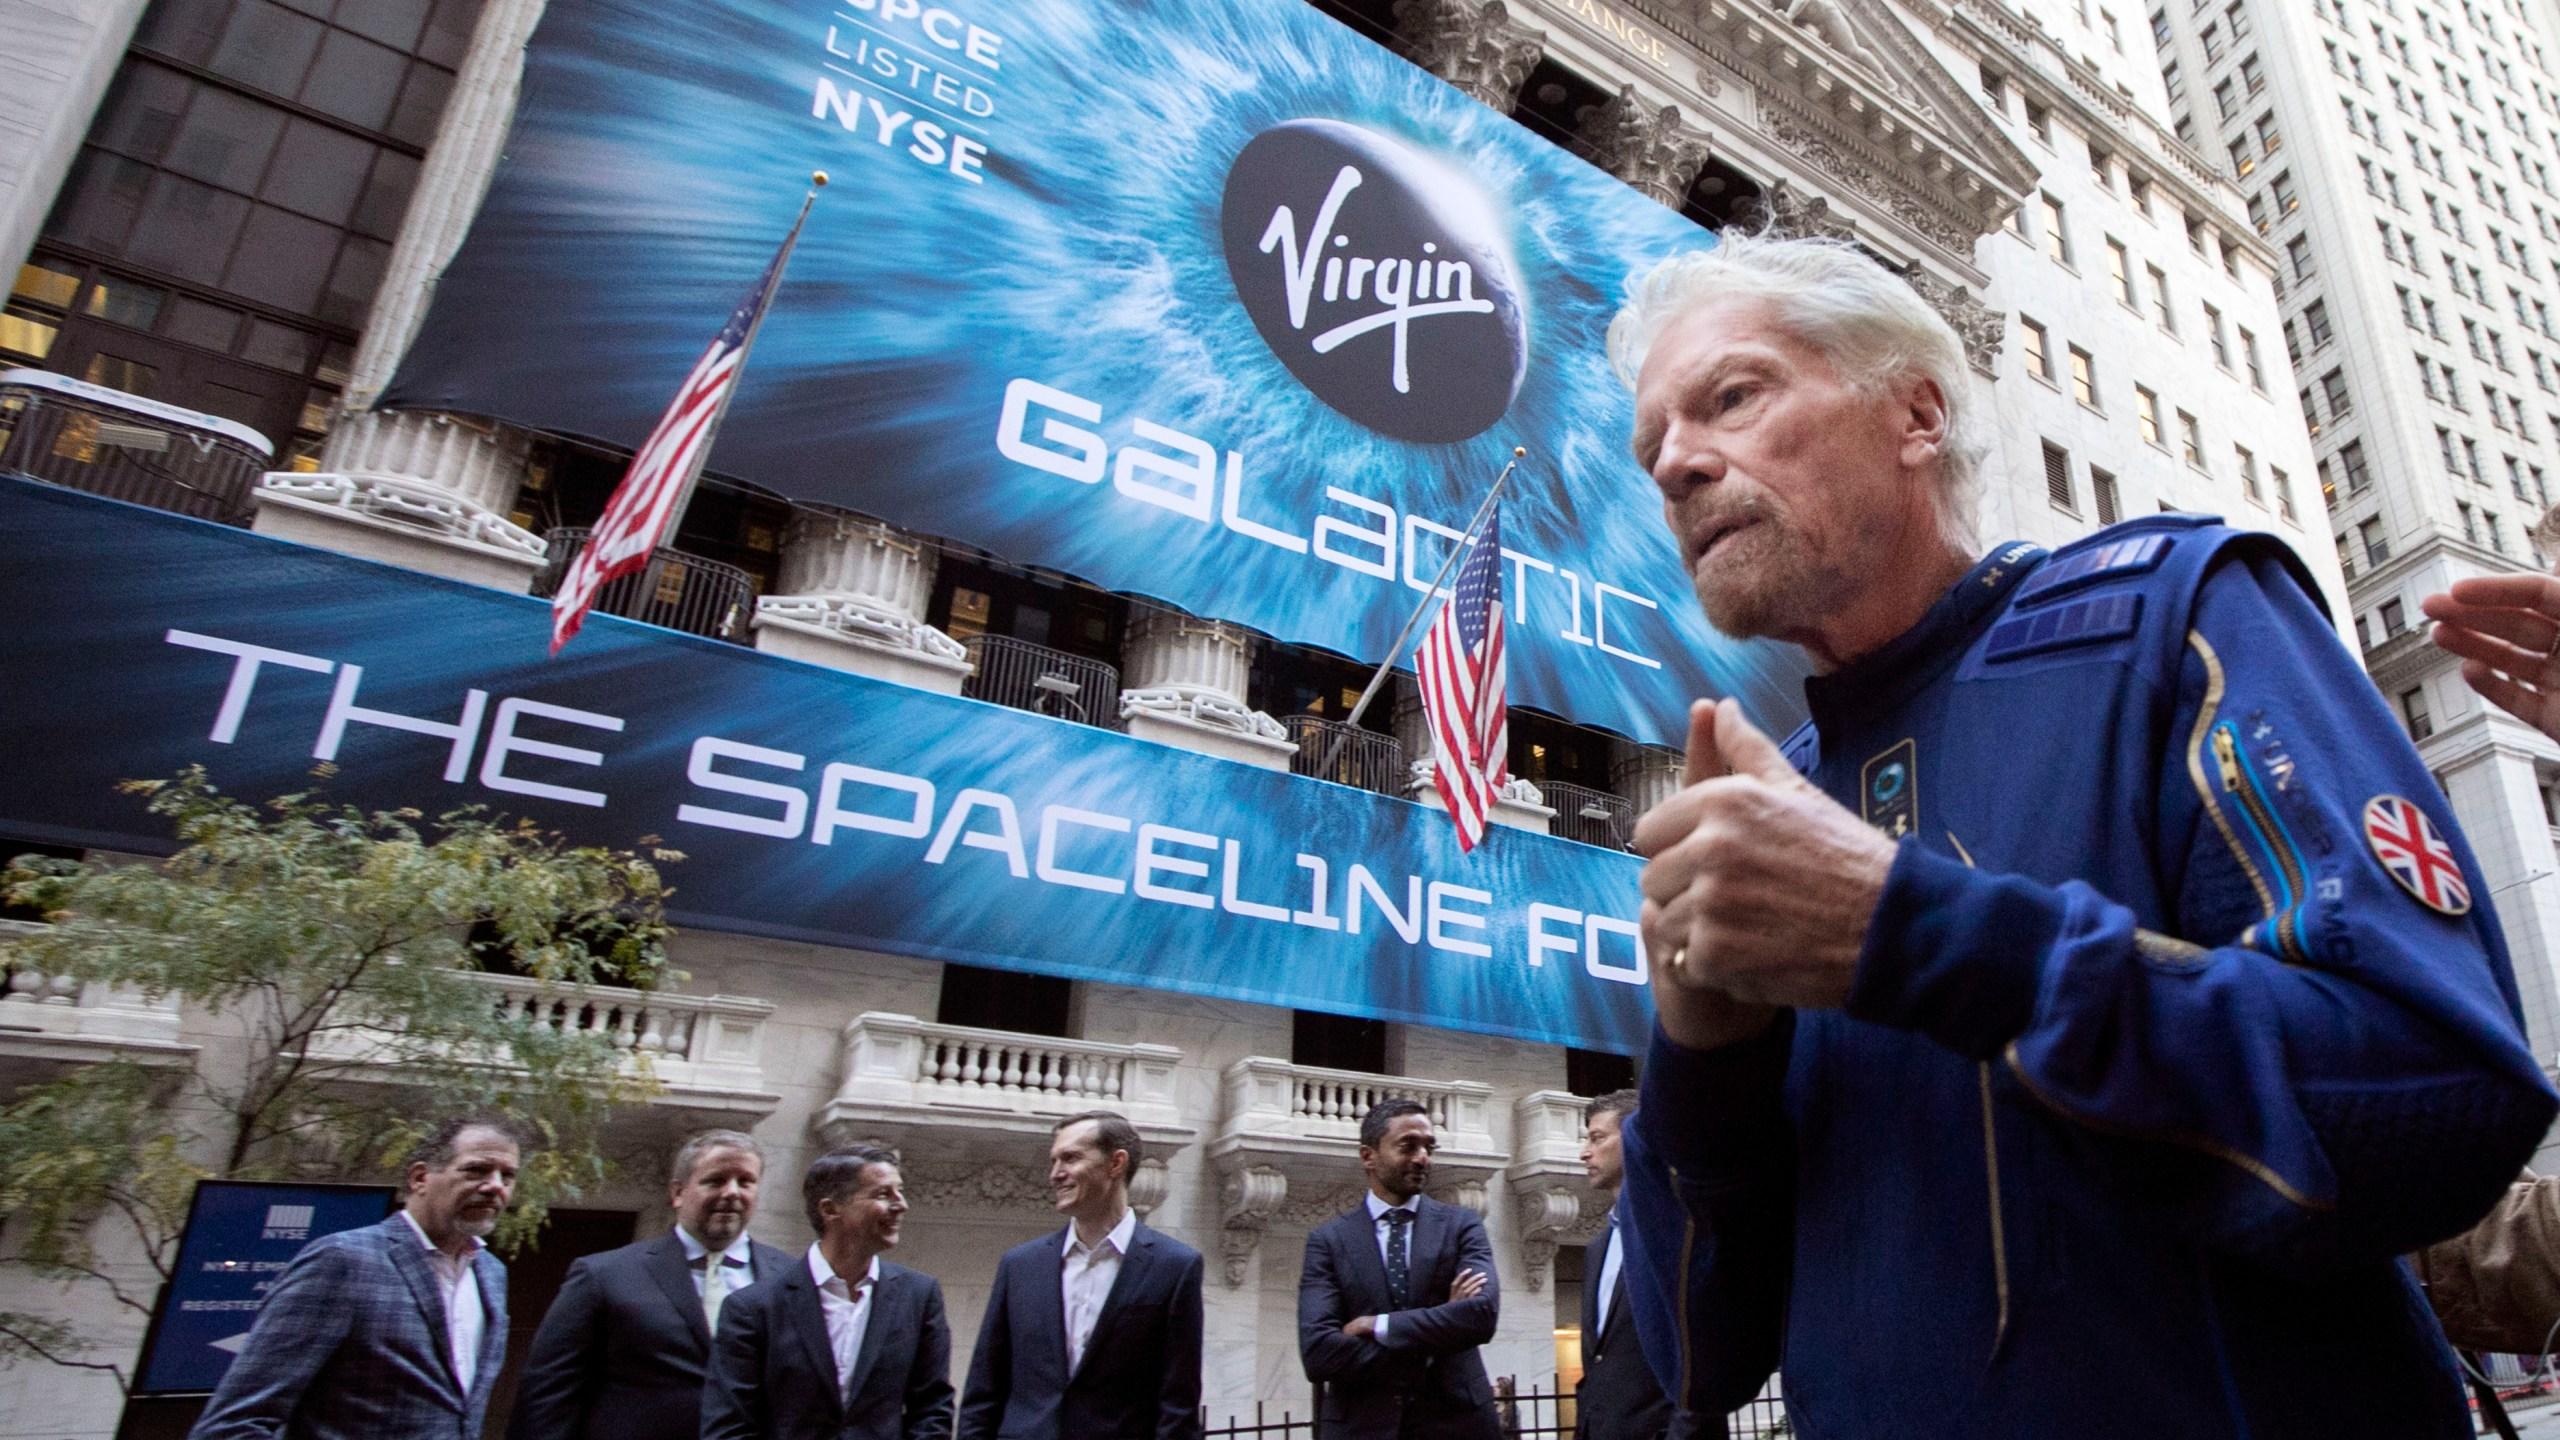 Richard Branson  - bab03288317a419abf5d046efa48cd04 - Branson mum on when he'll launch to space on Virgin Galactic | WWTI